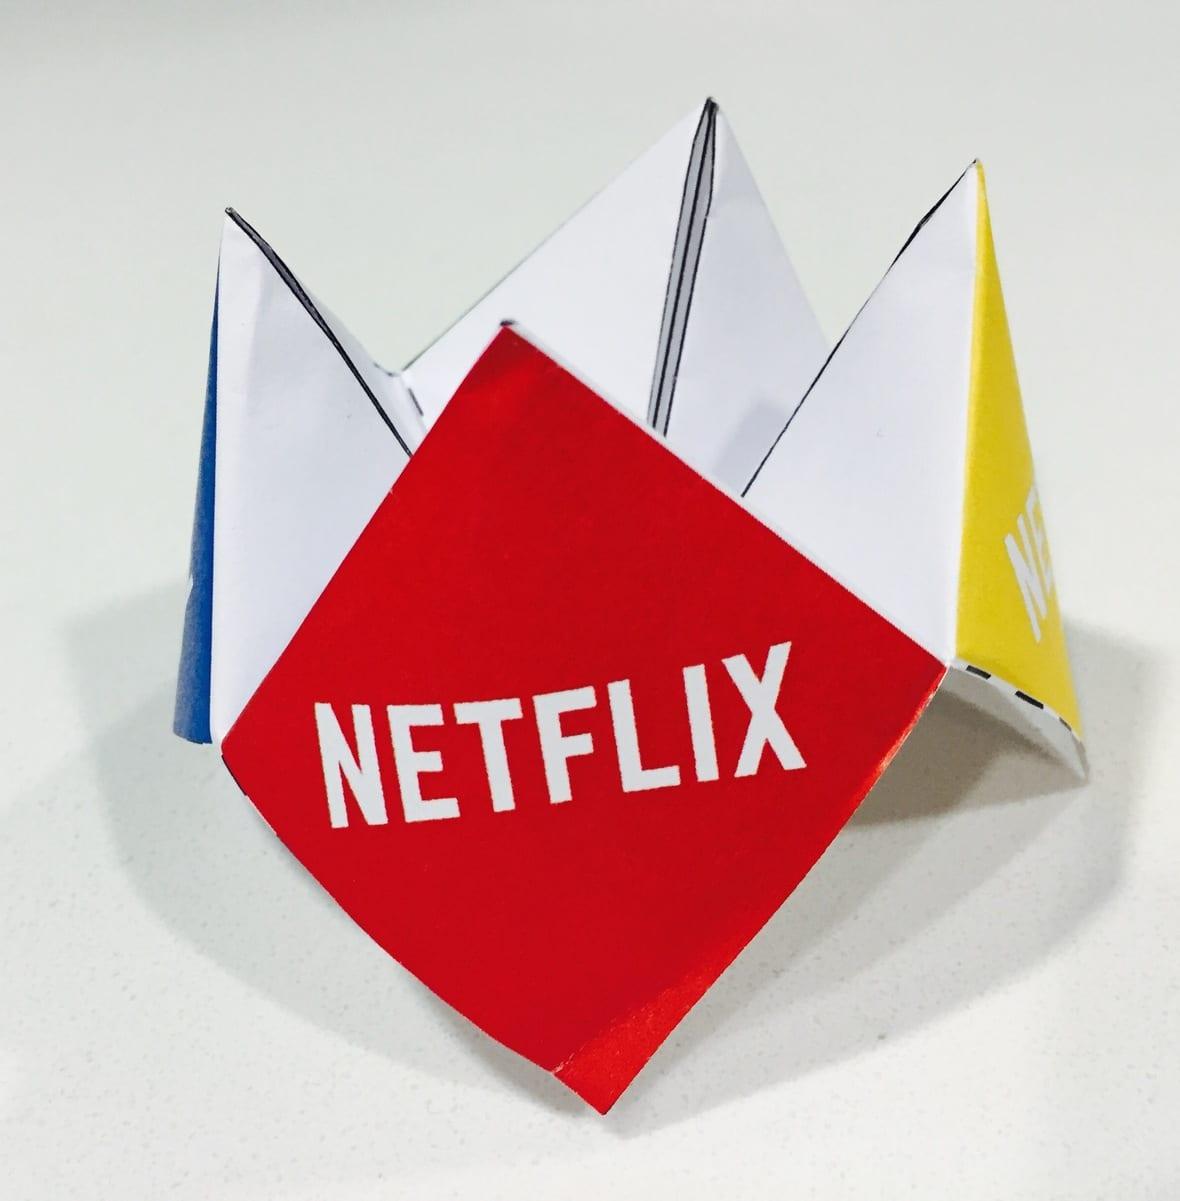 Netflix Fortune Teller